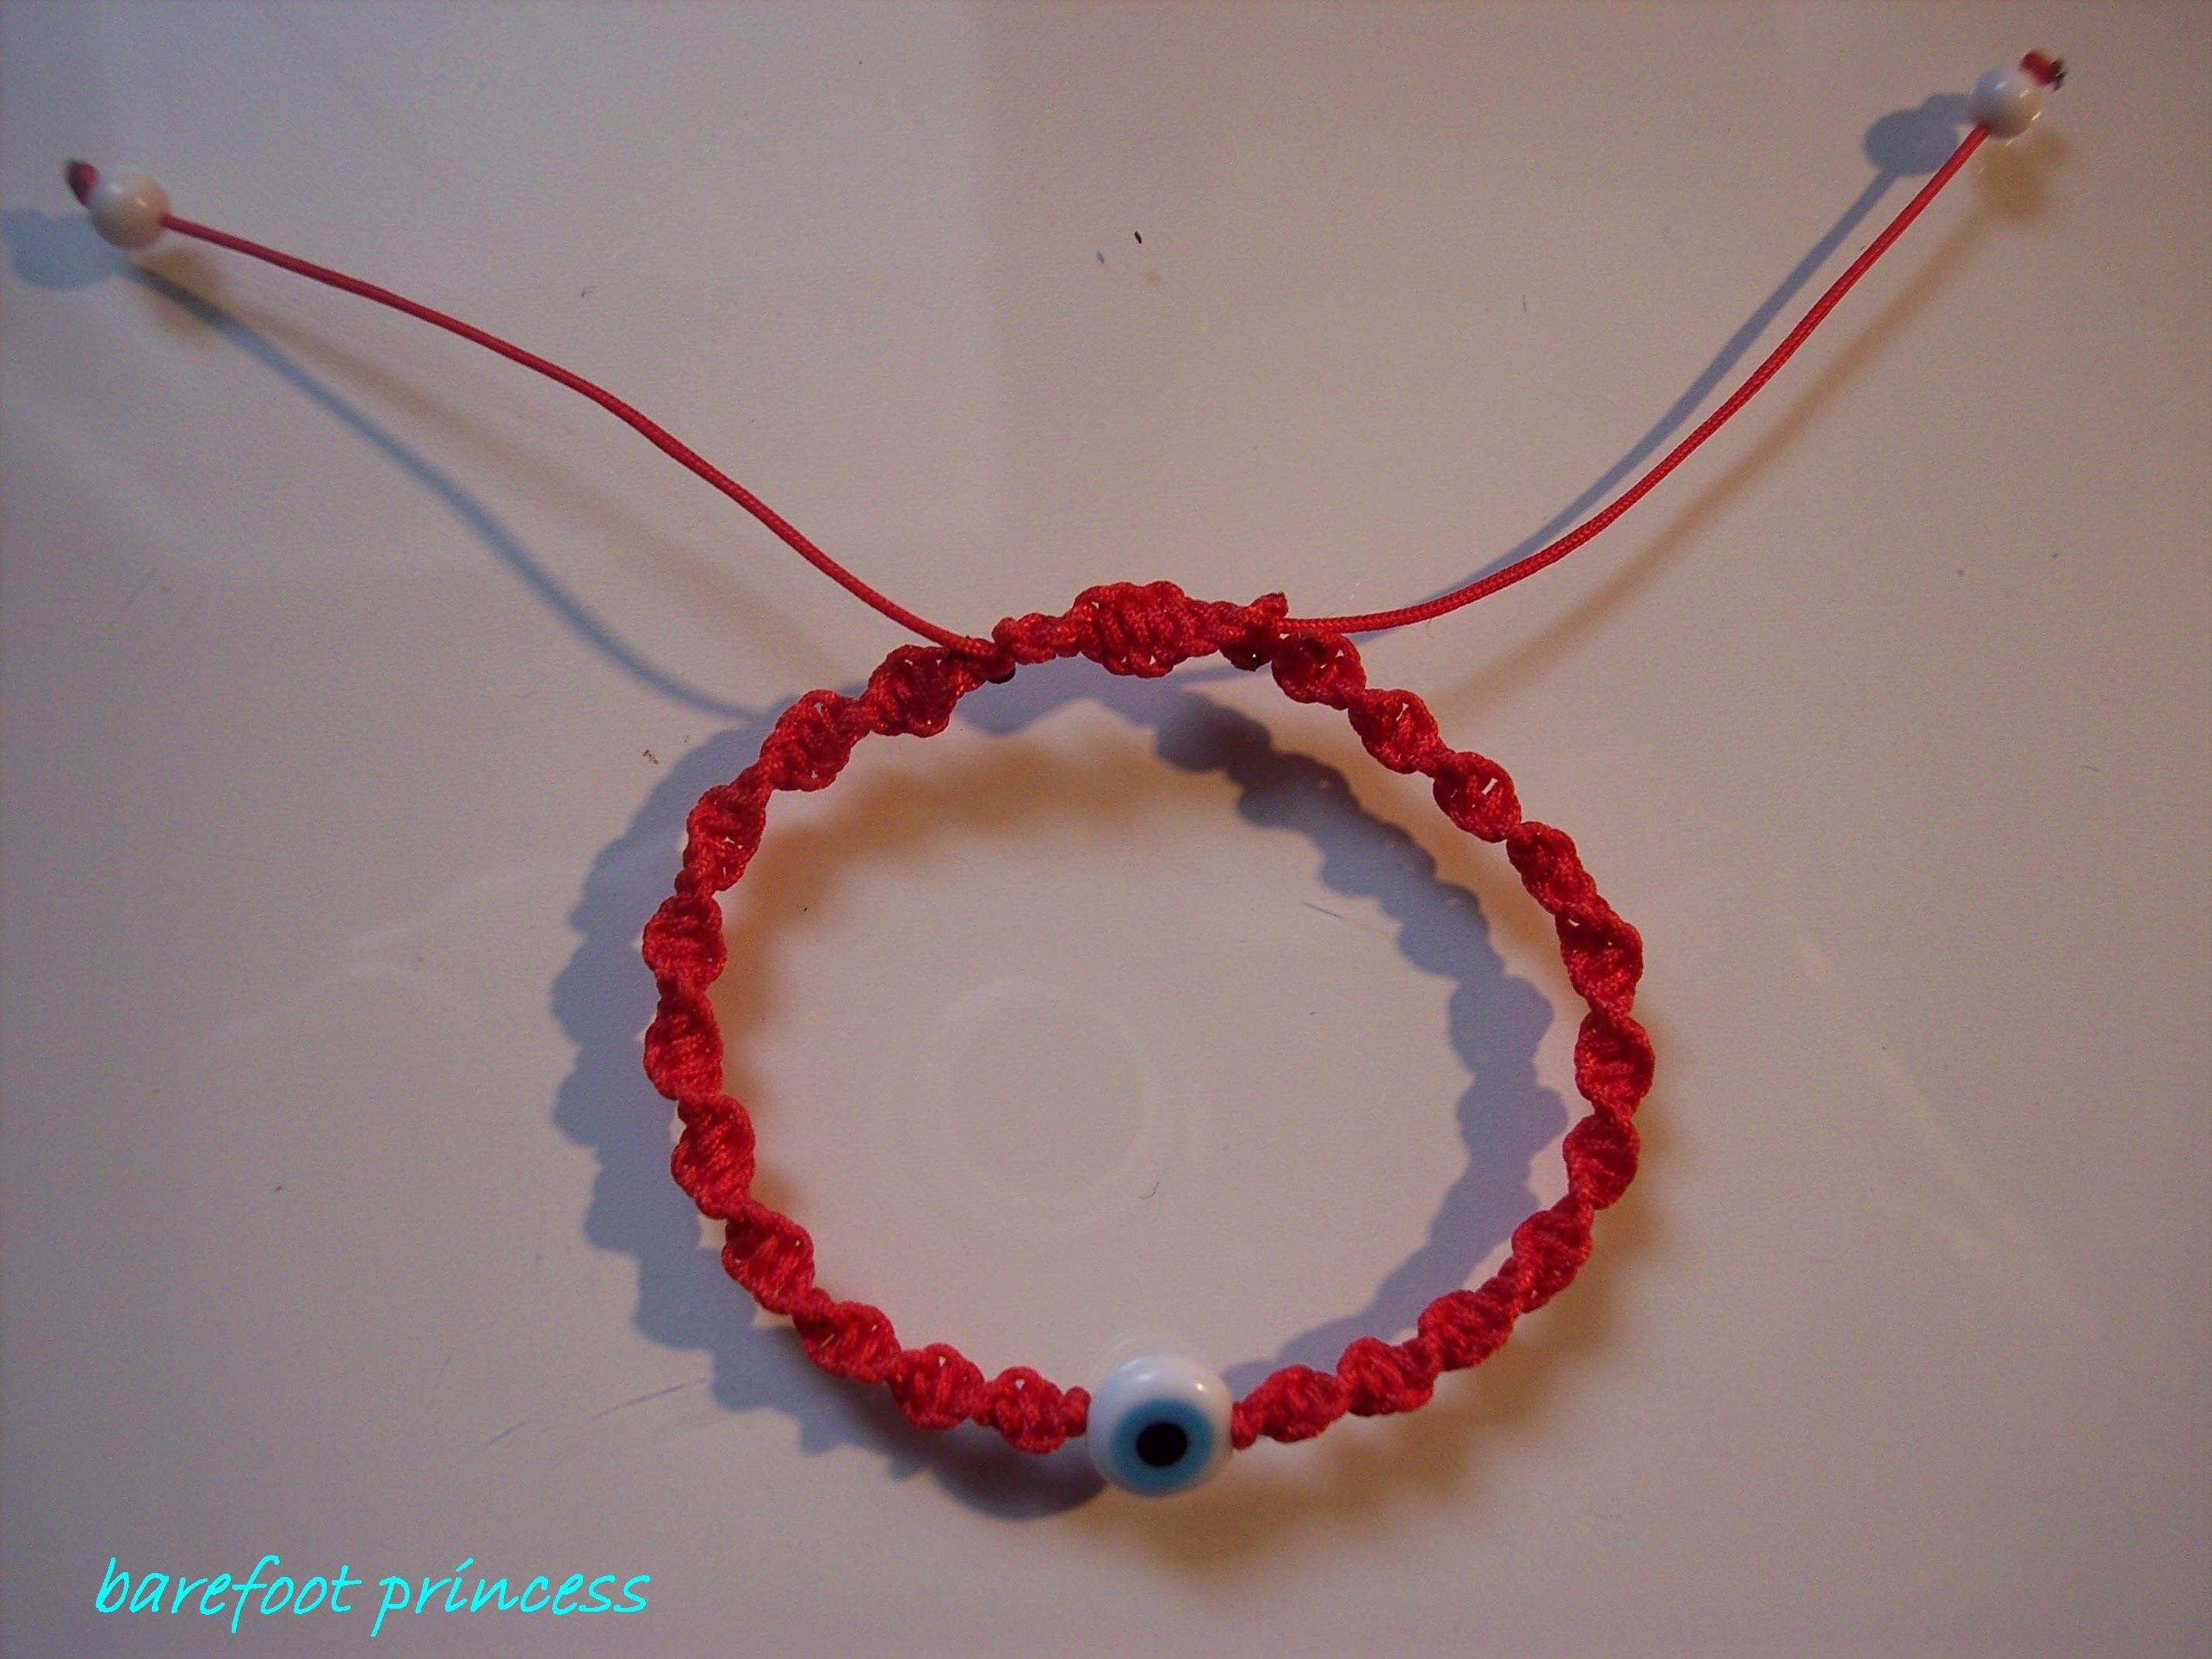 spring charm bracelet, barefoot princess